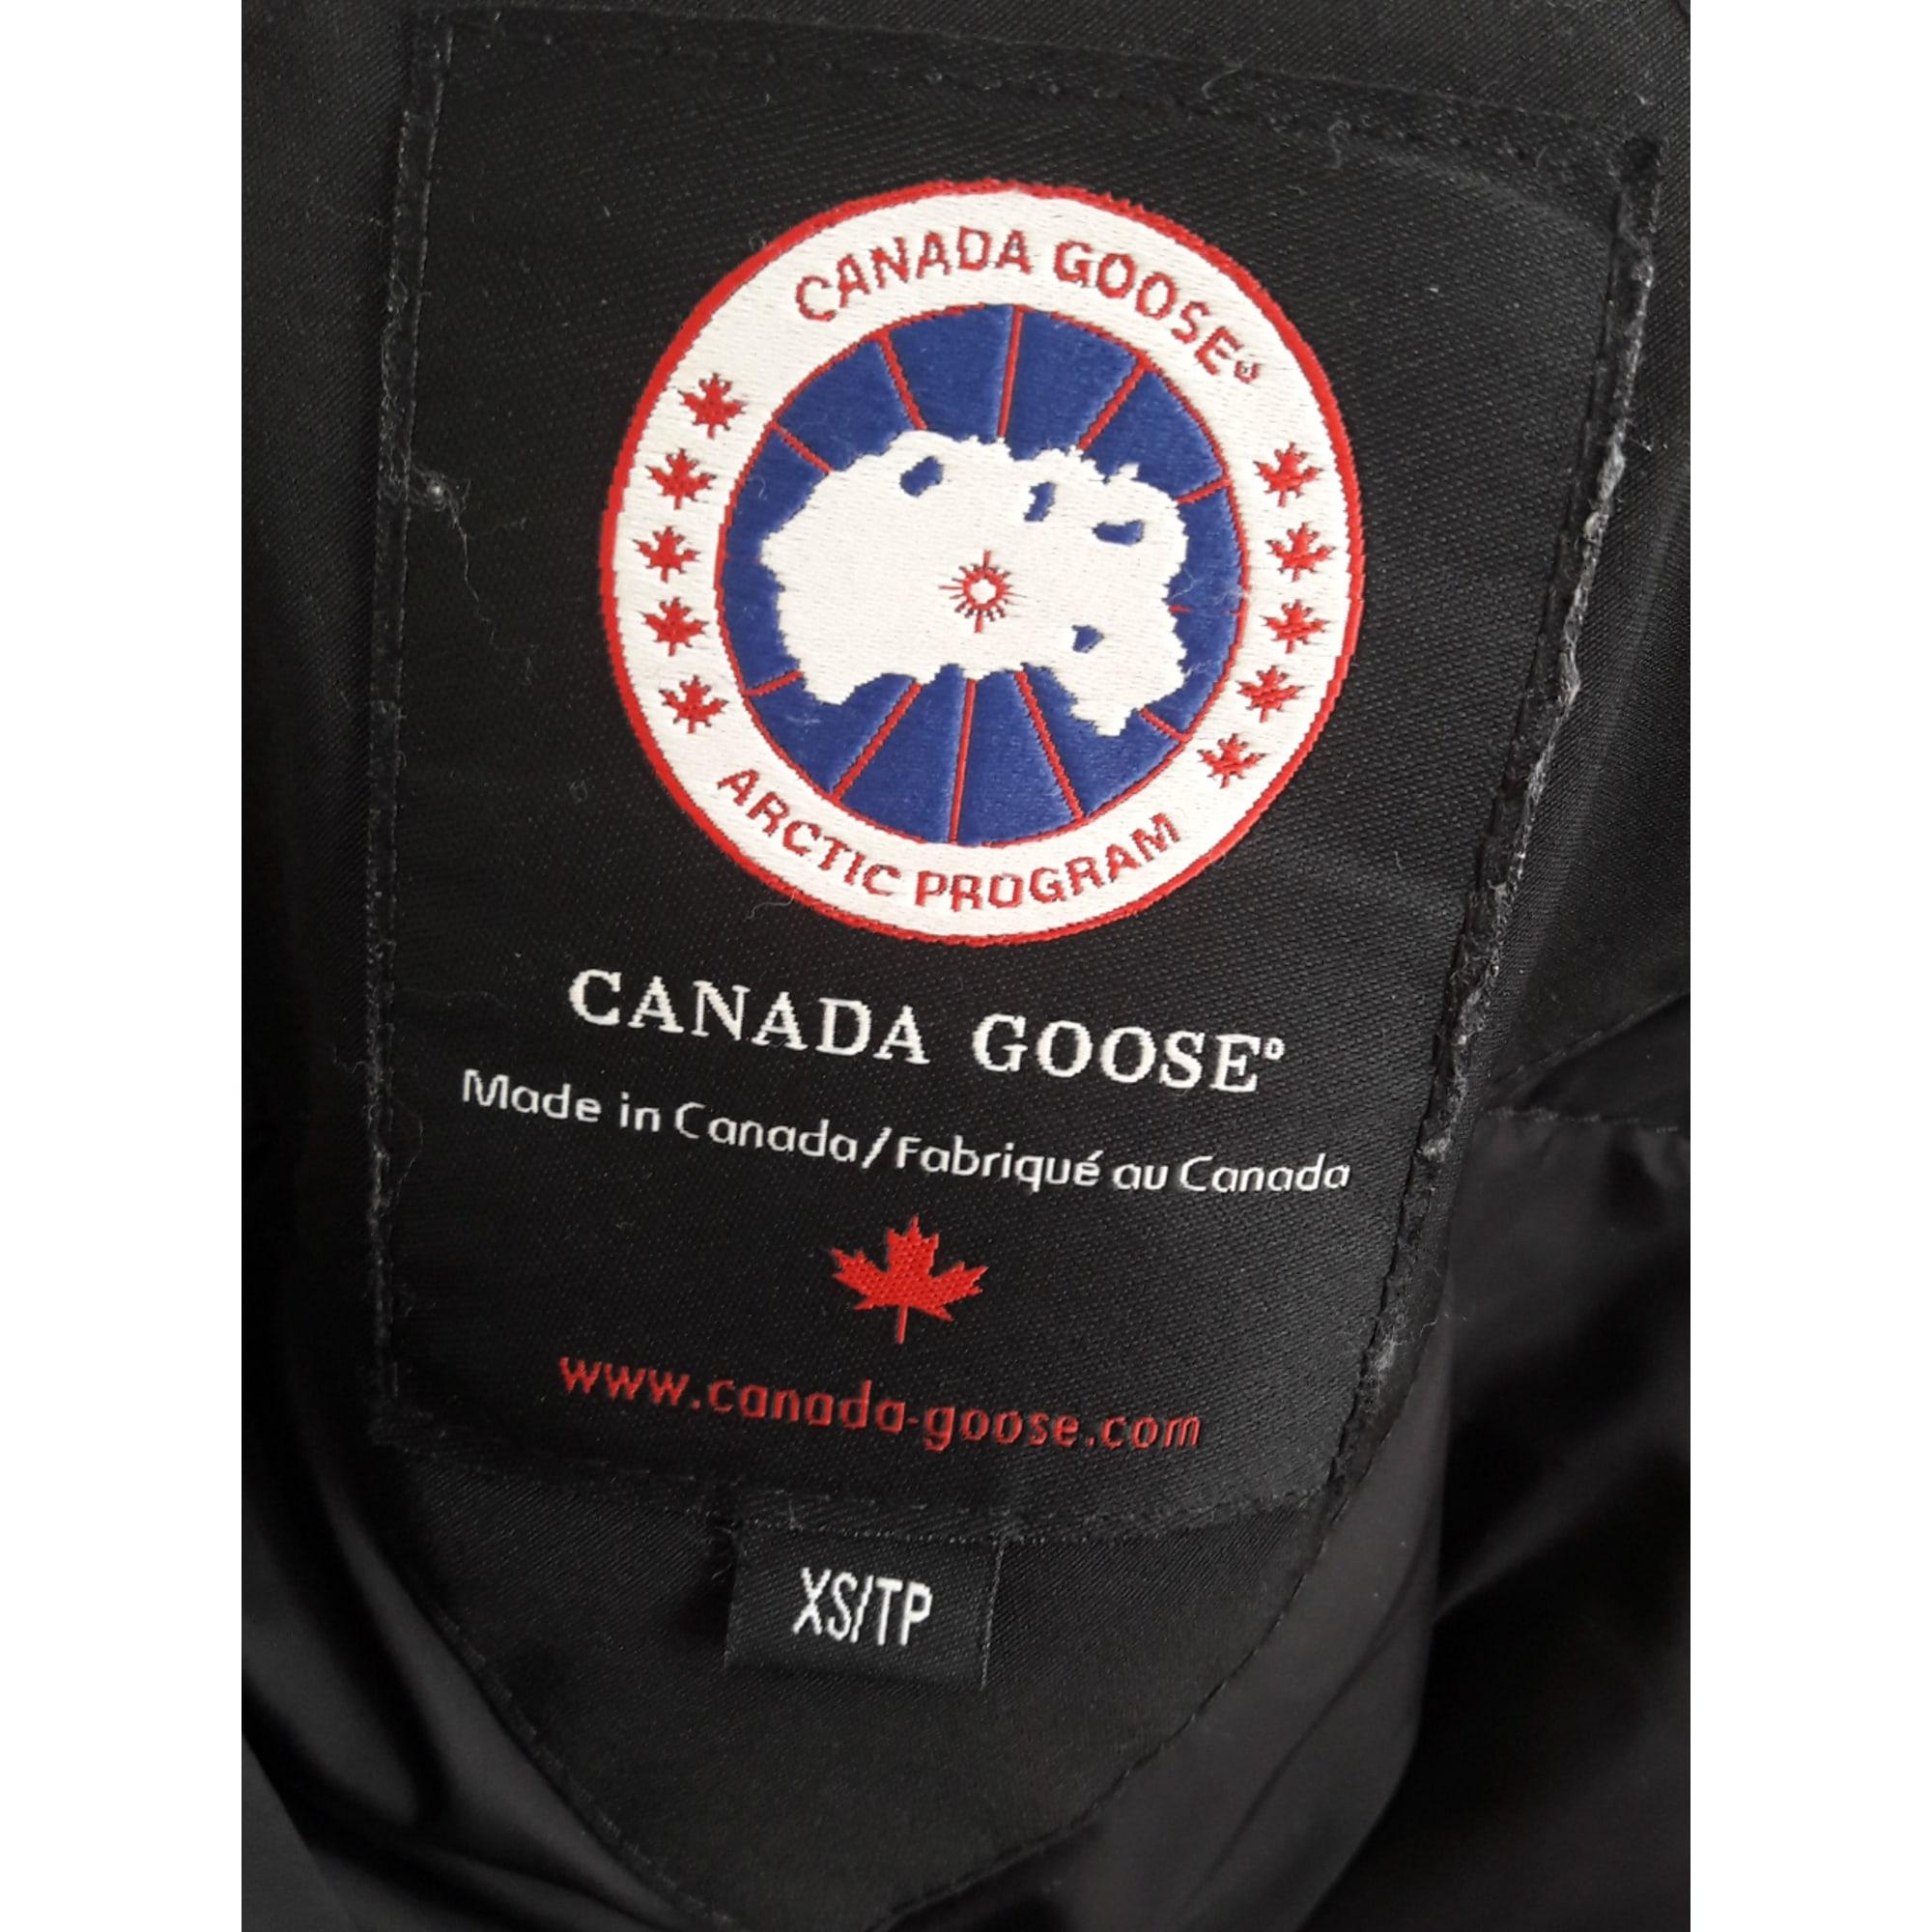 doudoune canada goose arctic program